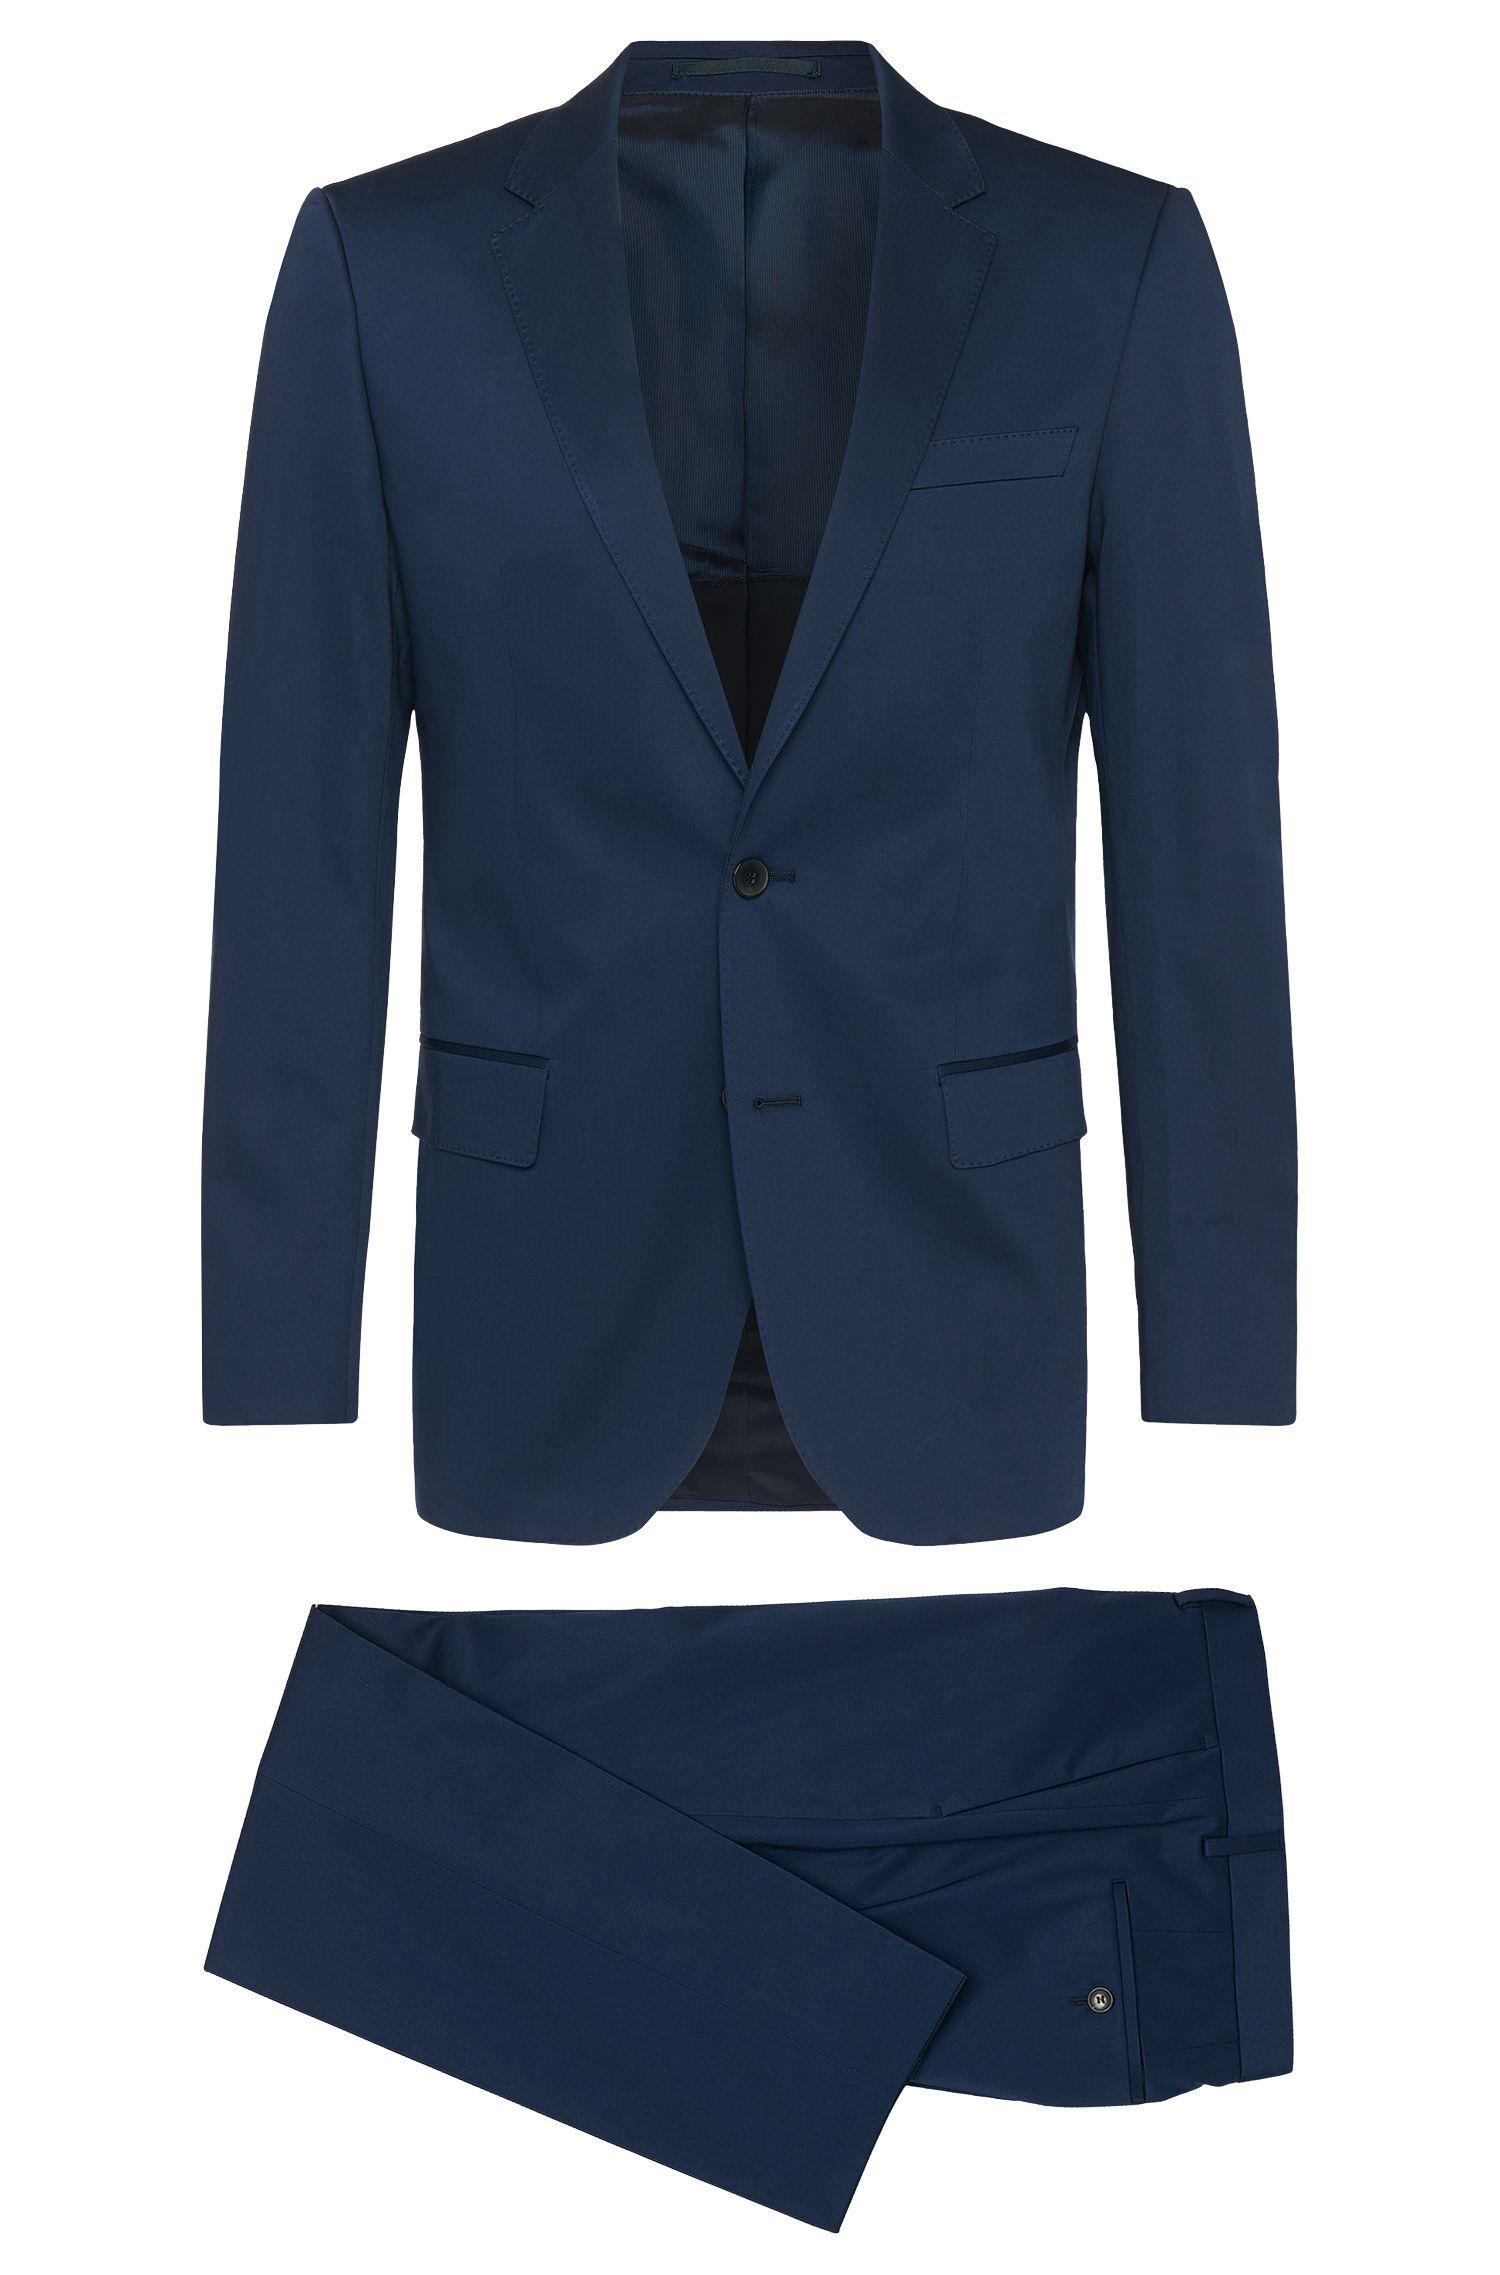 'Huge/Genius' | Slim Fit, Stretch Cotton Suit